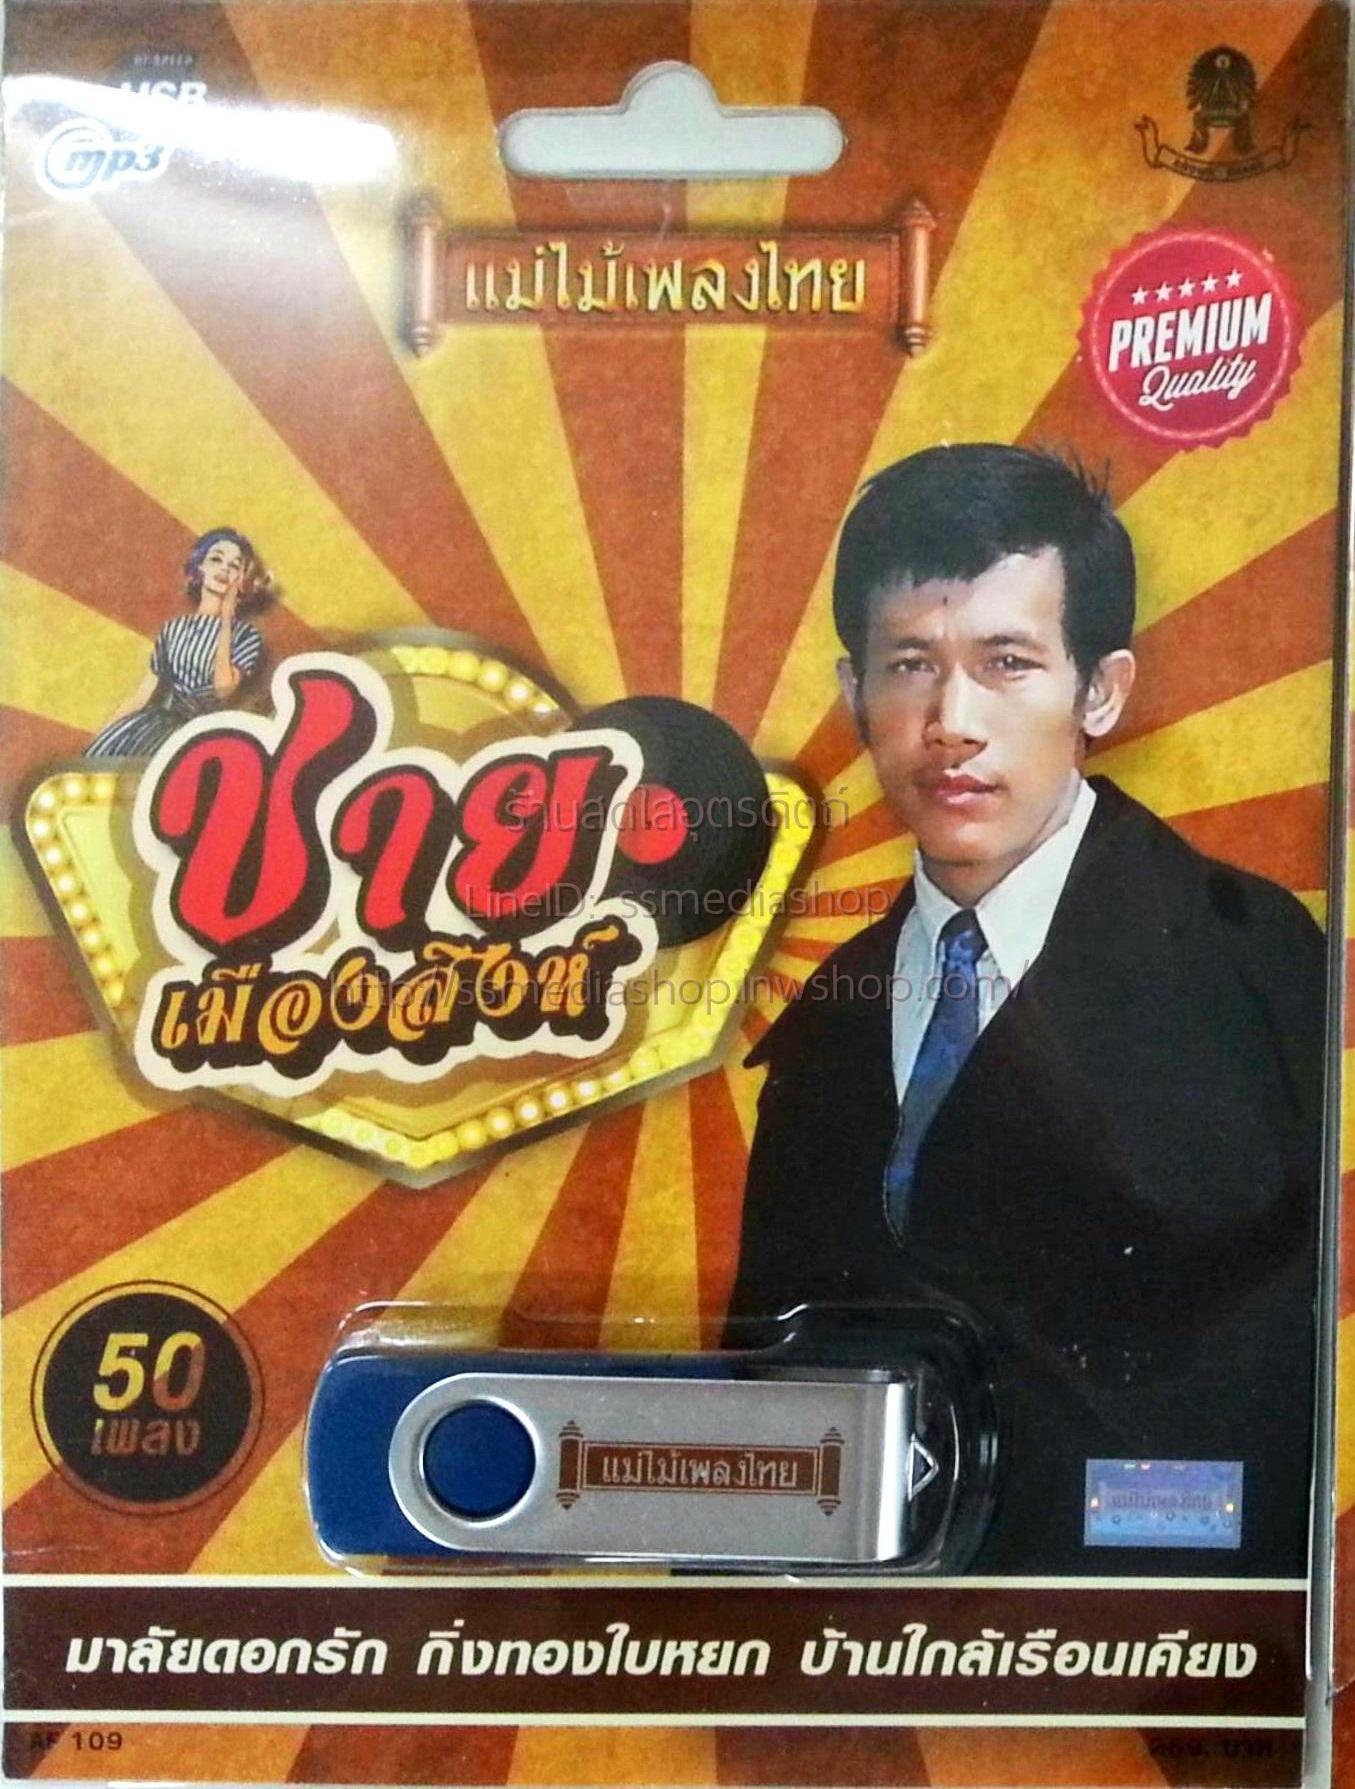 USB+เพลง ชาย เมืองสิงห์